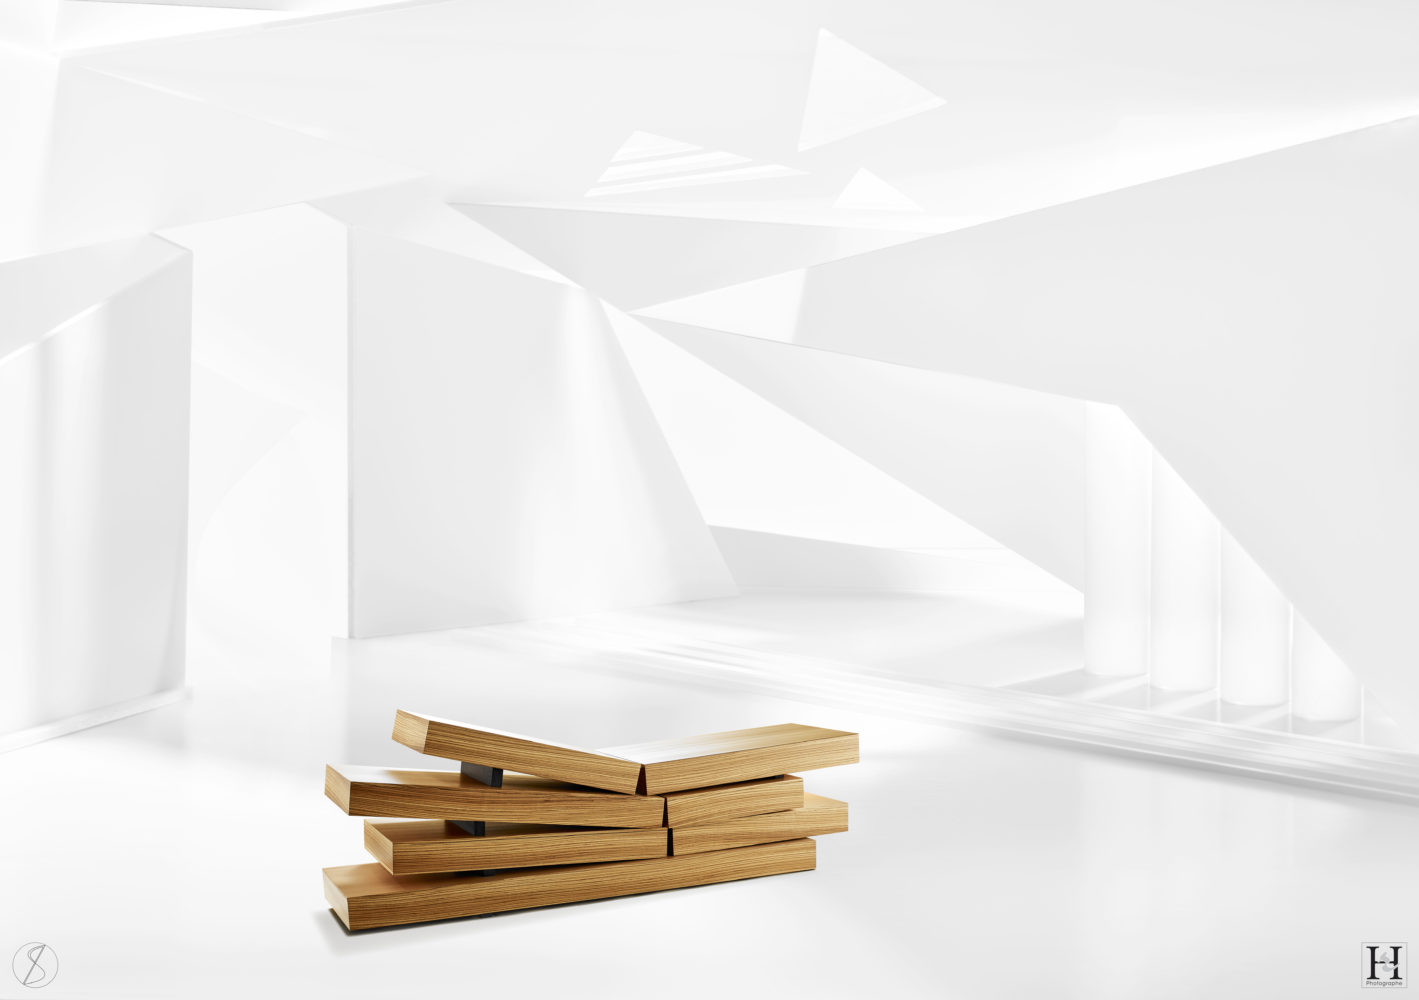 Creation-Stephane-Pennec-FraK-decor-2